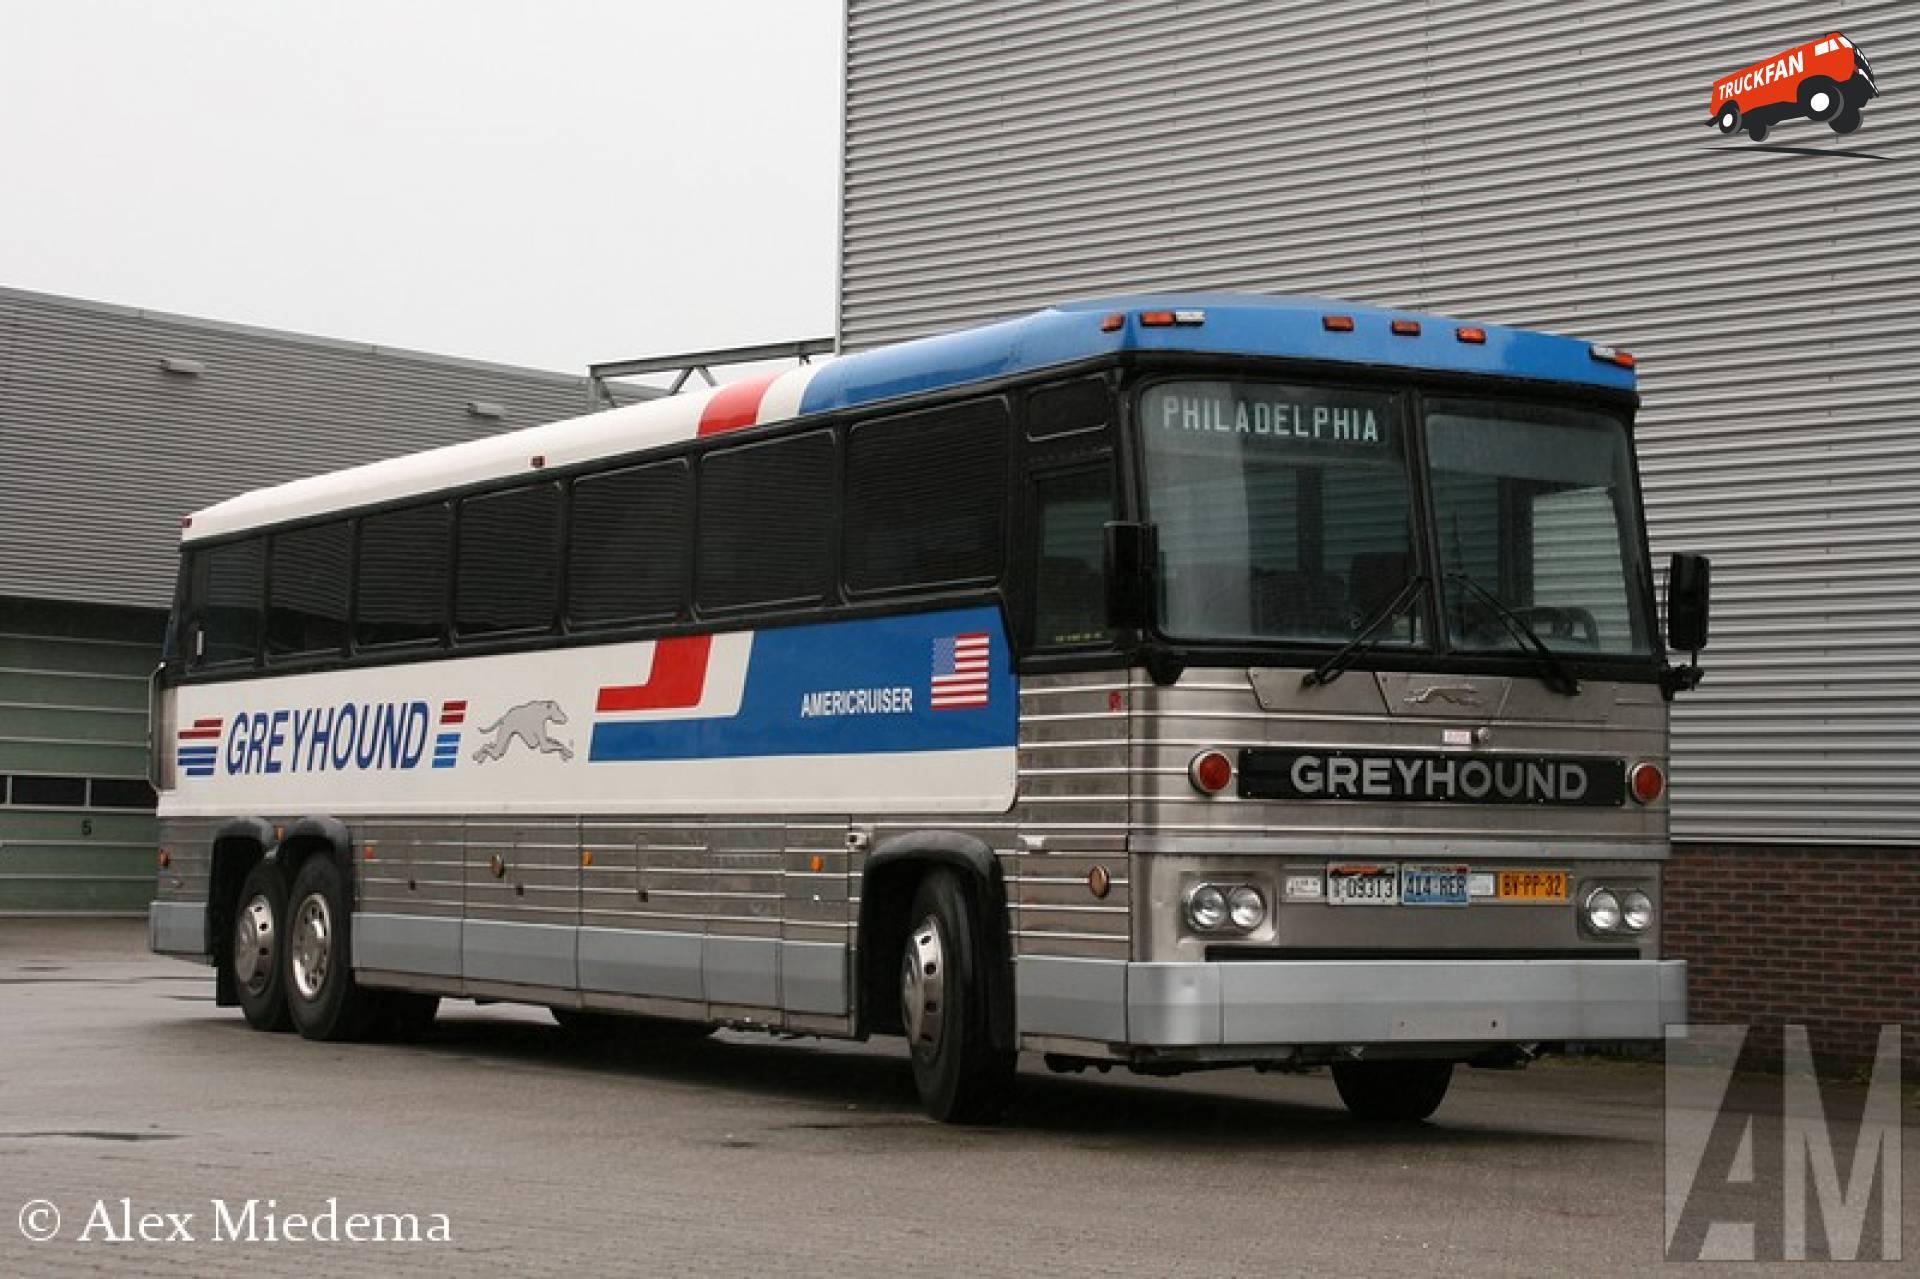 MCI Greyhound bus